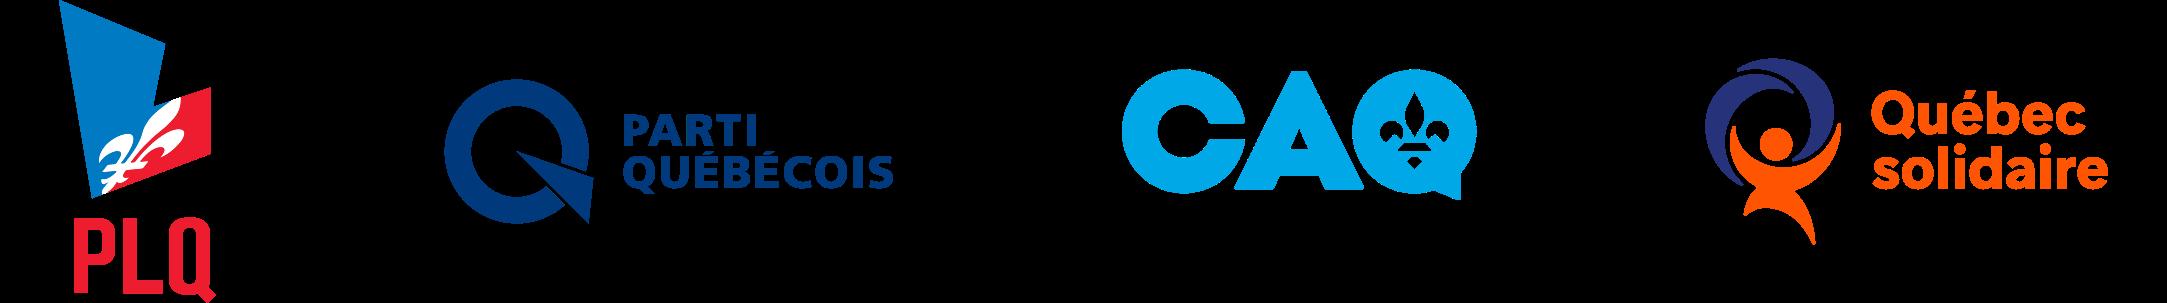 Logos des partis ensemble_long